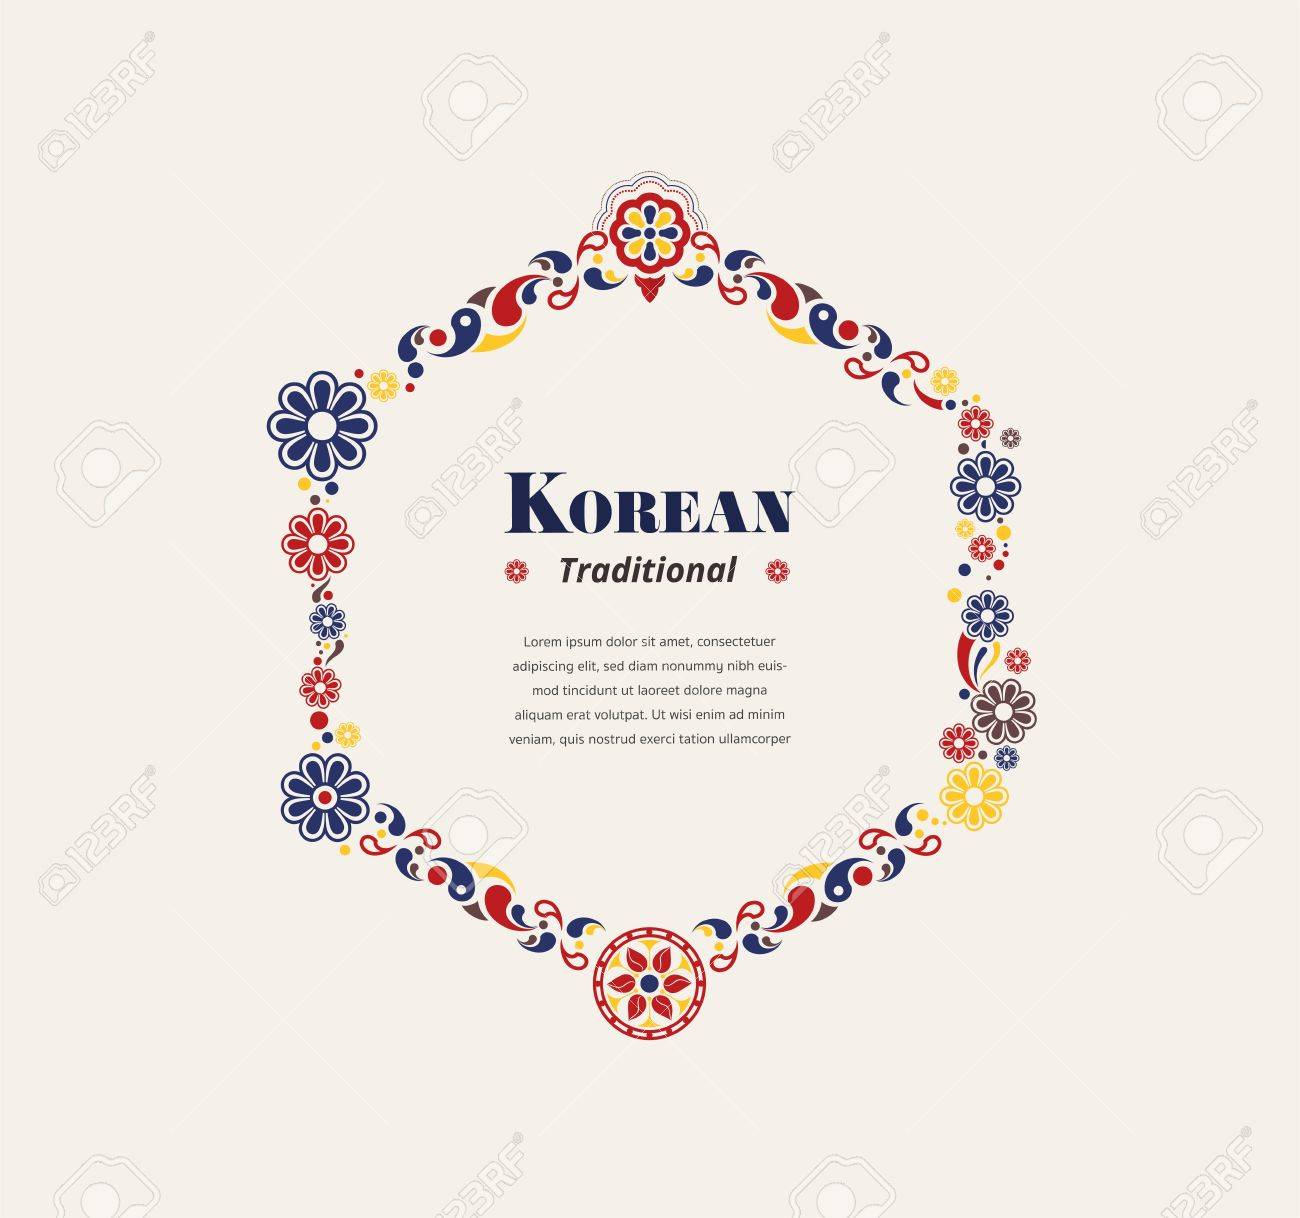 1aa7ec633cd Korea traditional hexagon frame. modern abstract traditional. vector  illustration. Stock Vector - 87532160